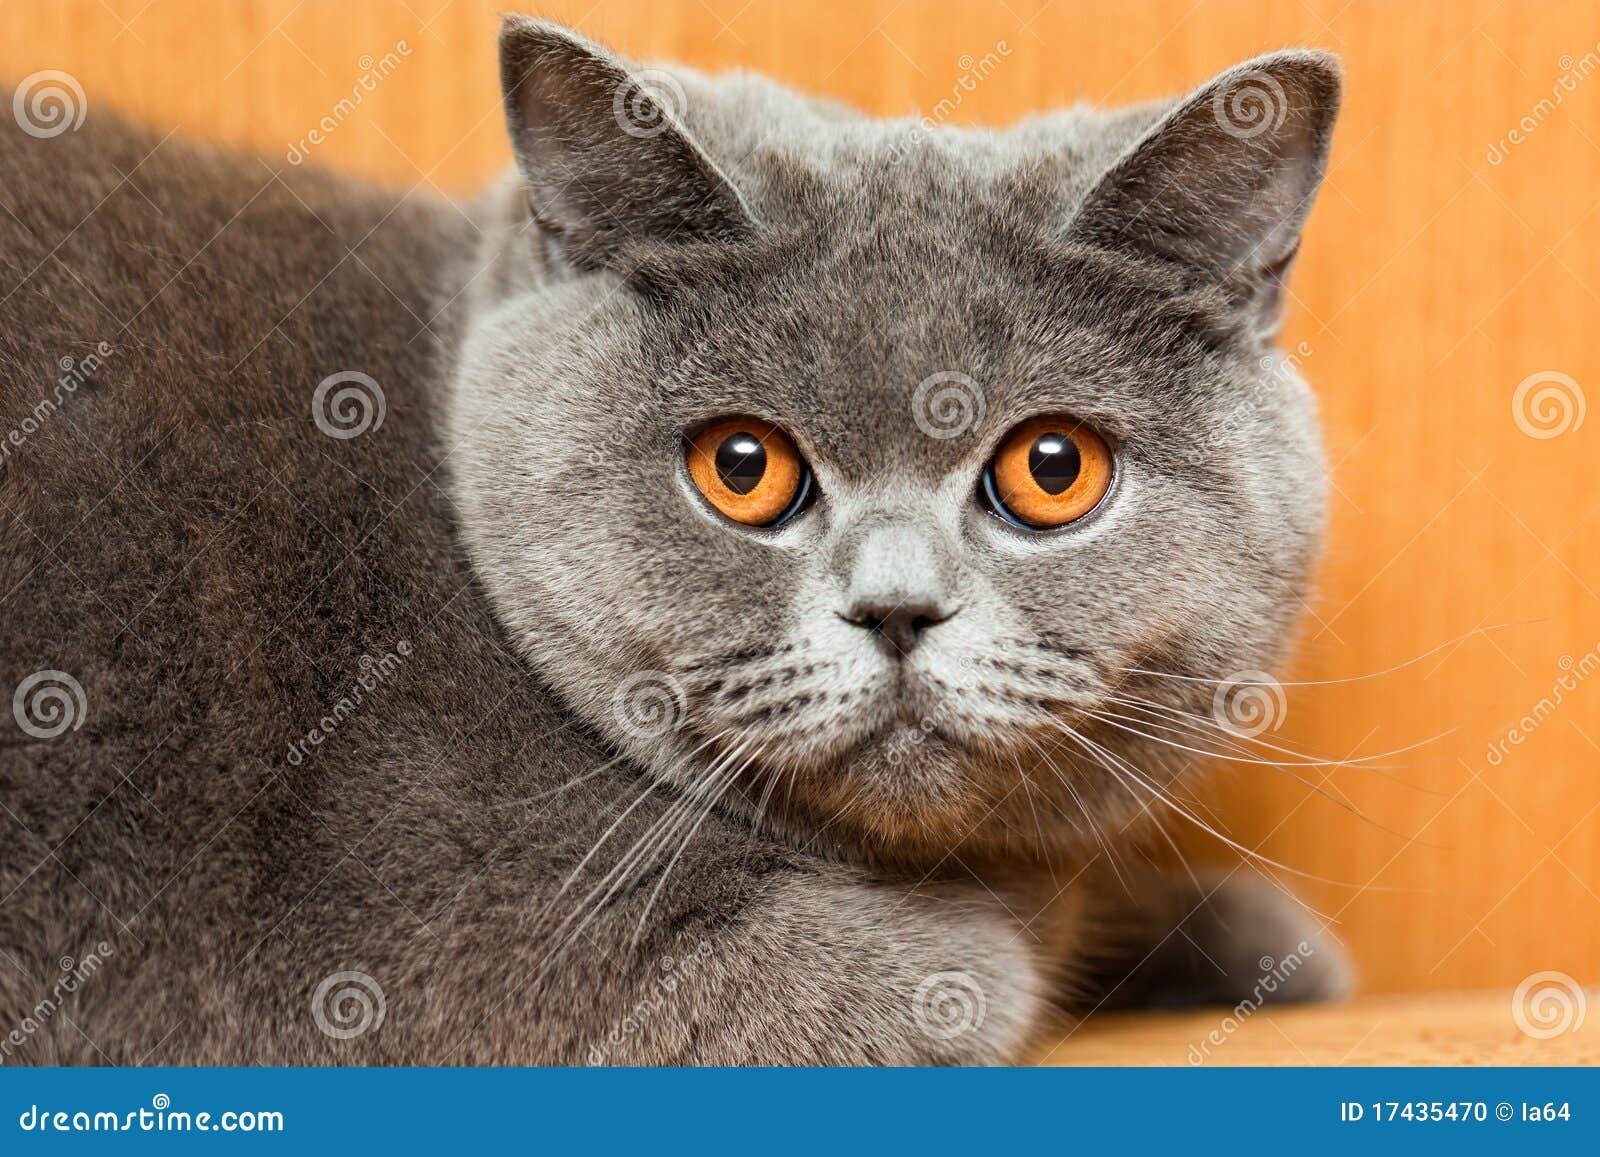 Feline animal pet british domestic cat looking eye.